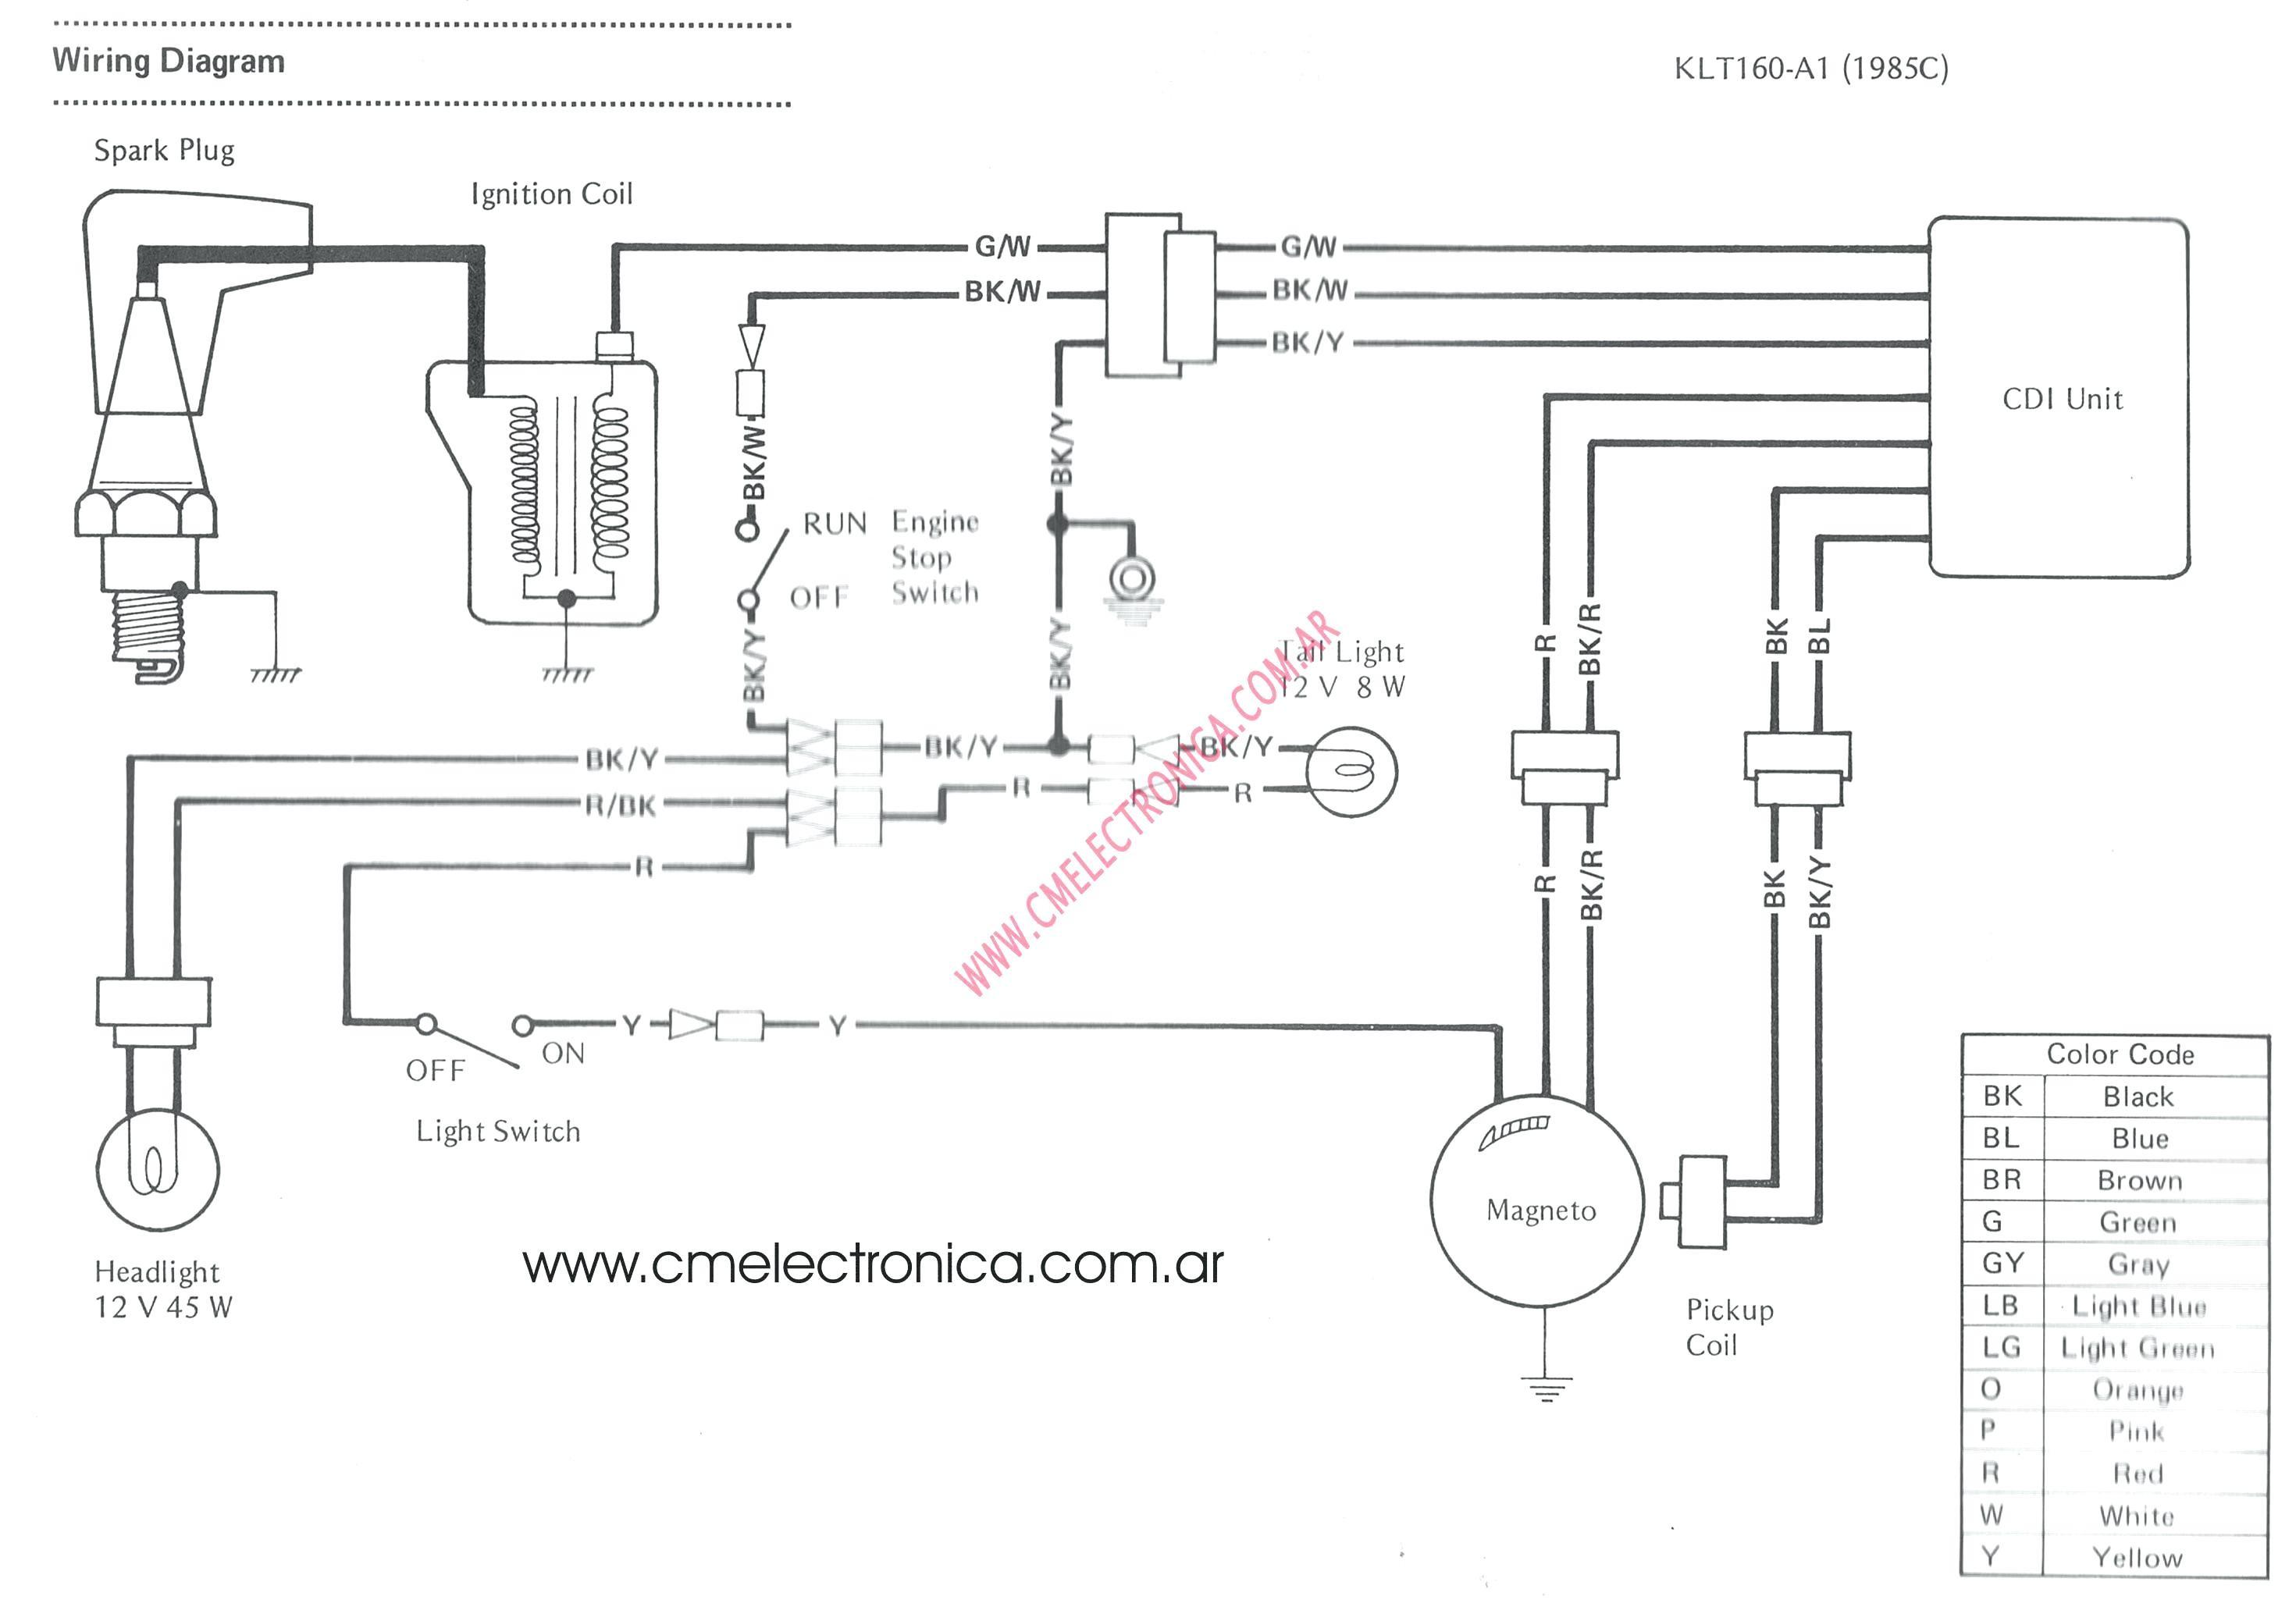 John Deere 4020 12 Volt Wiring Diagram Elegant | Wiring Diagram Image